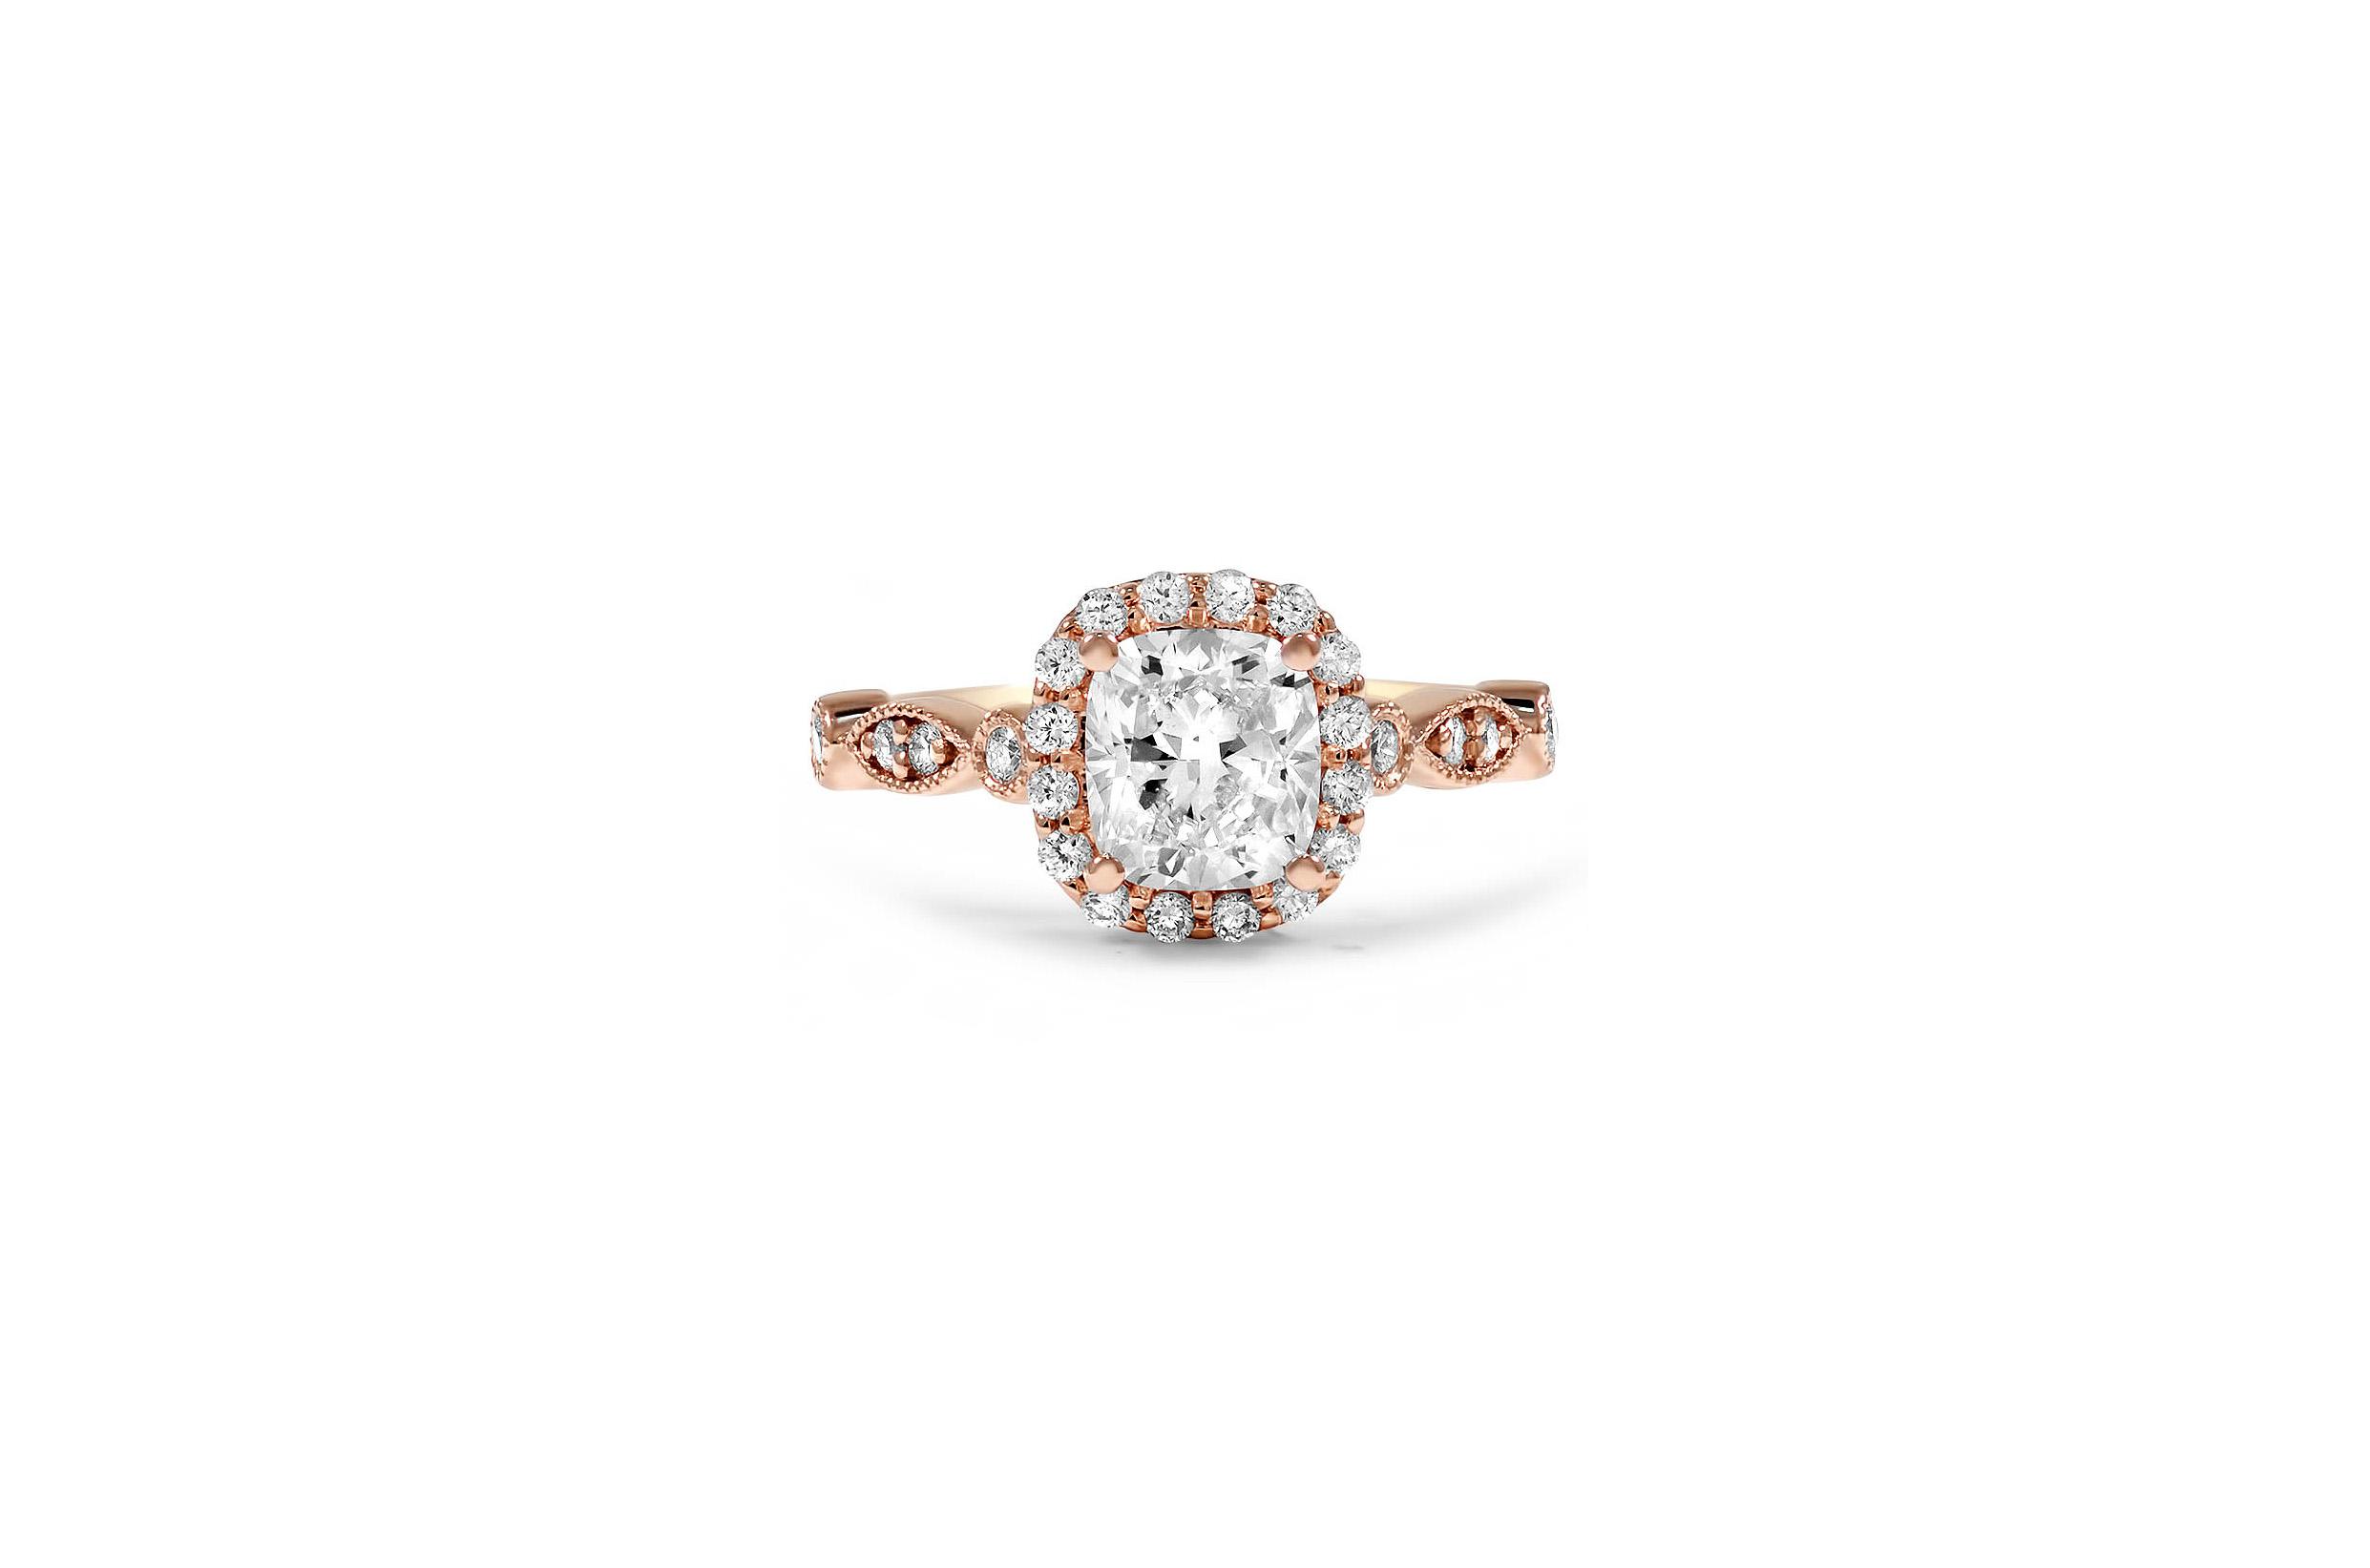 brilliant earth cushion cut diamond engagement ring rose gold tiara inspired